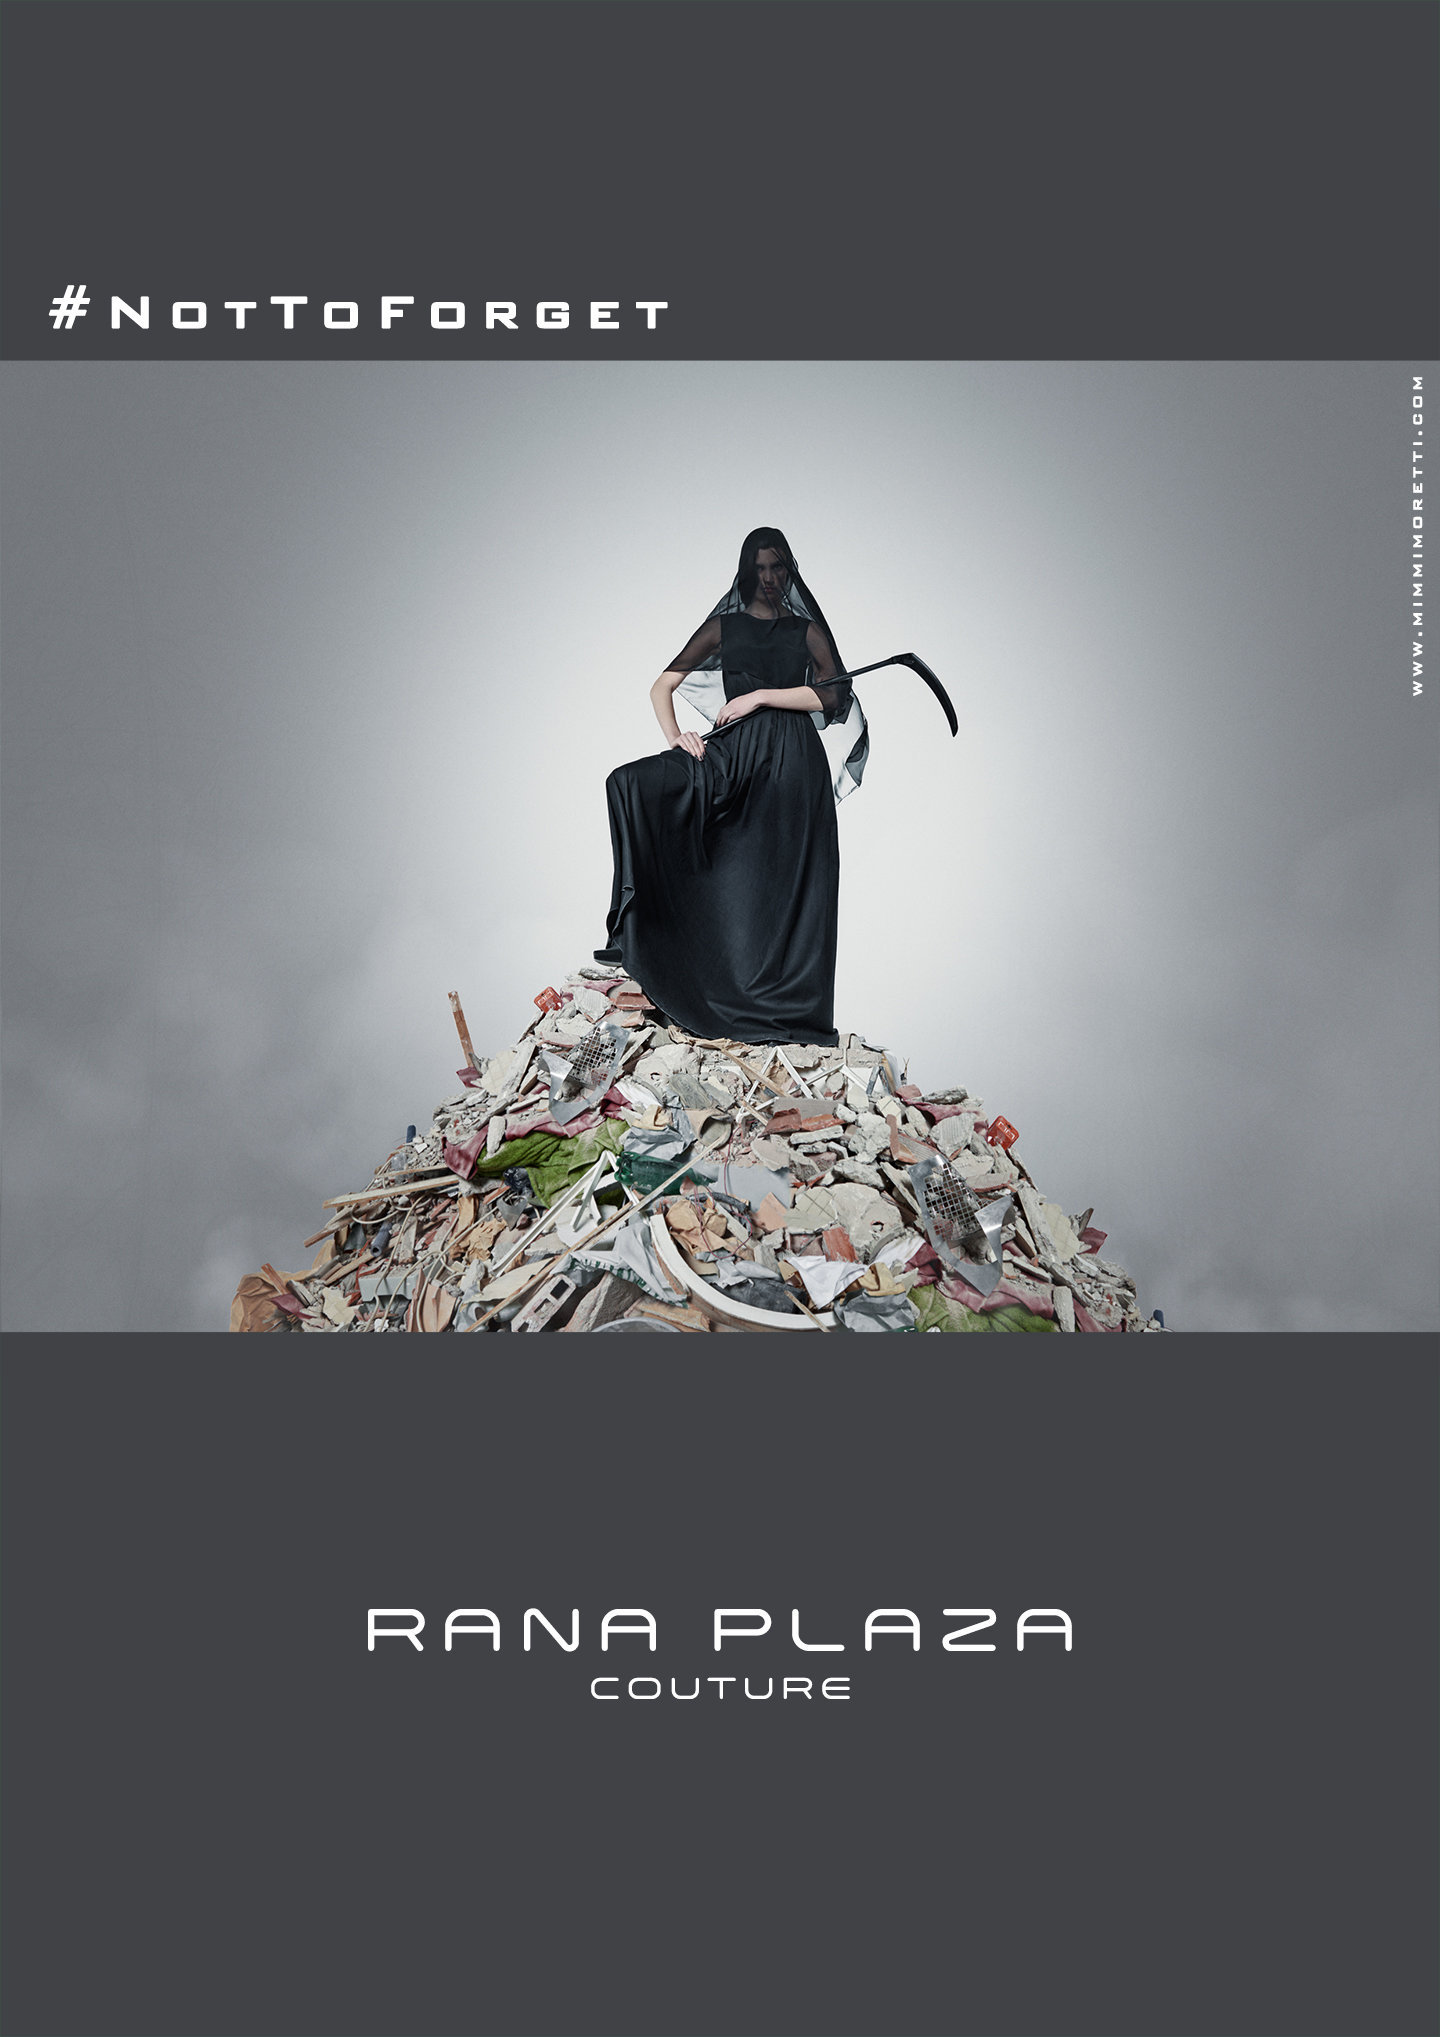 Rana Plaza Couture